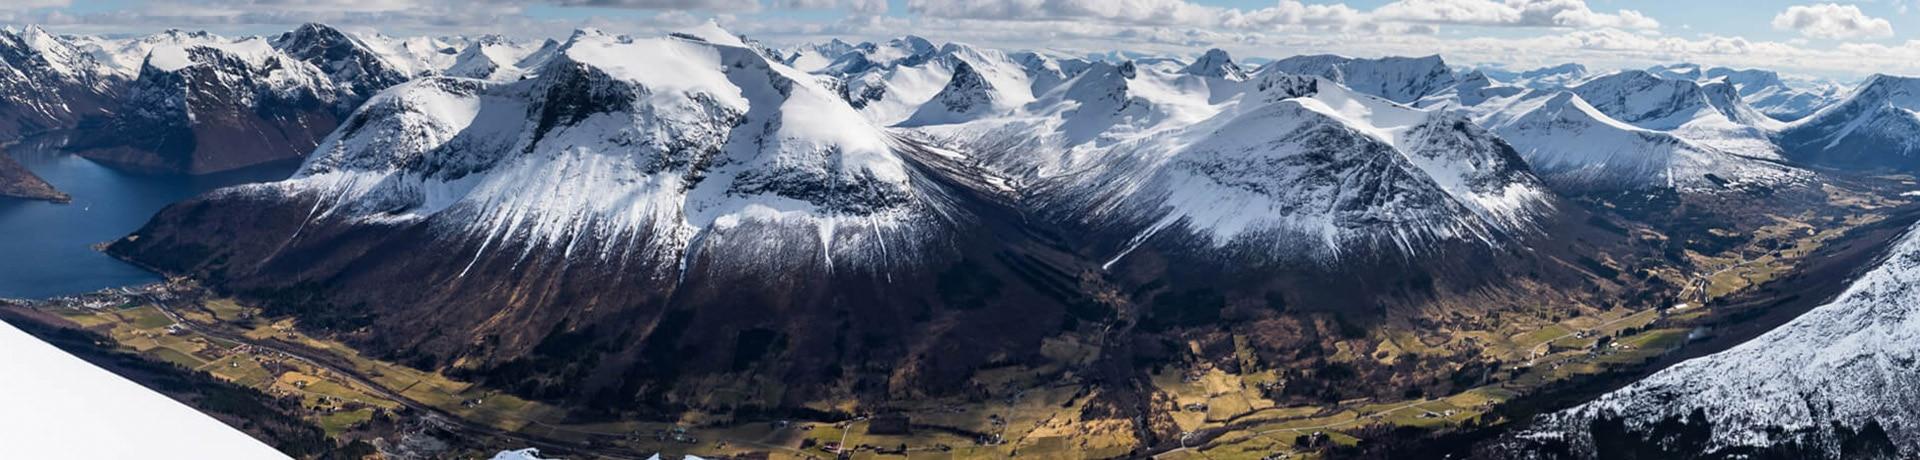 Alpene i vest